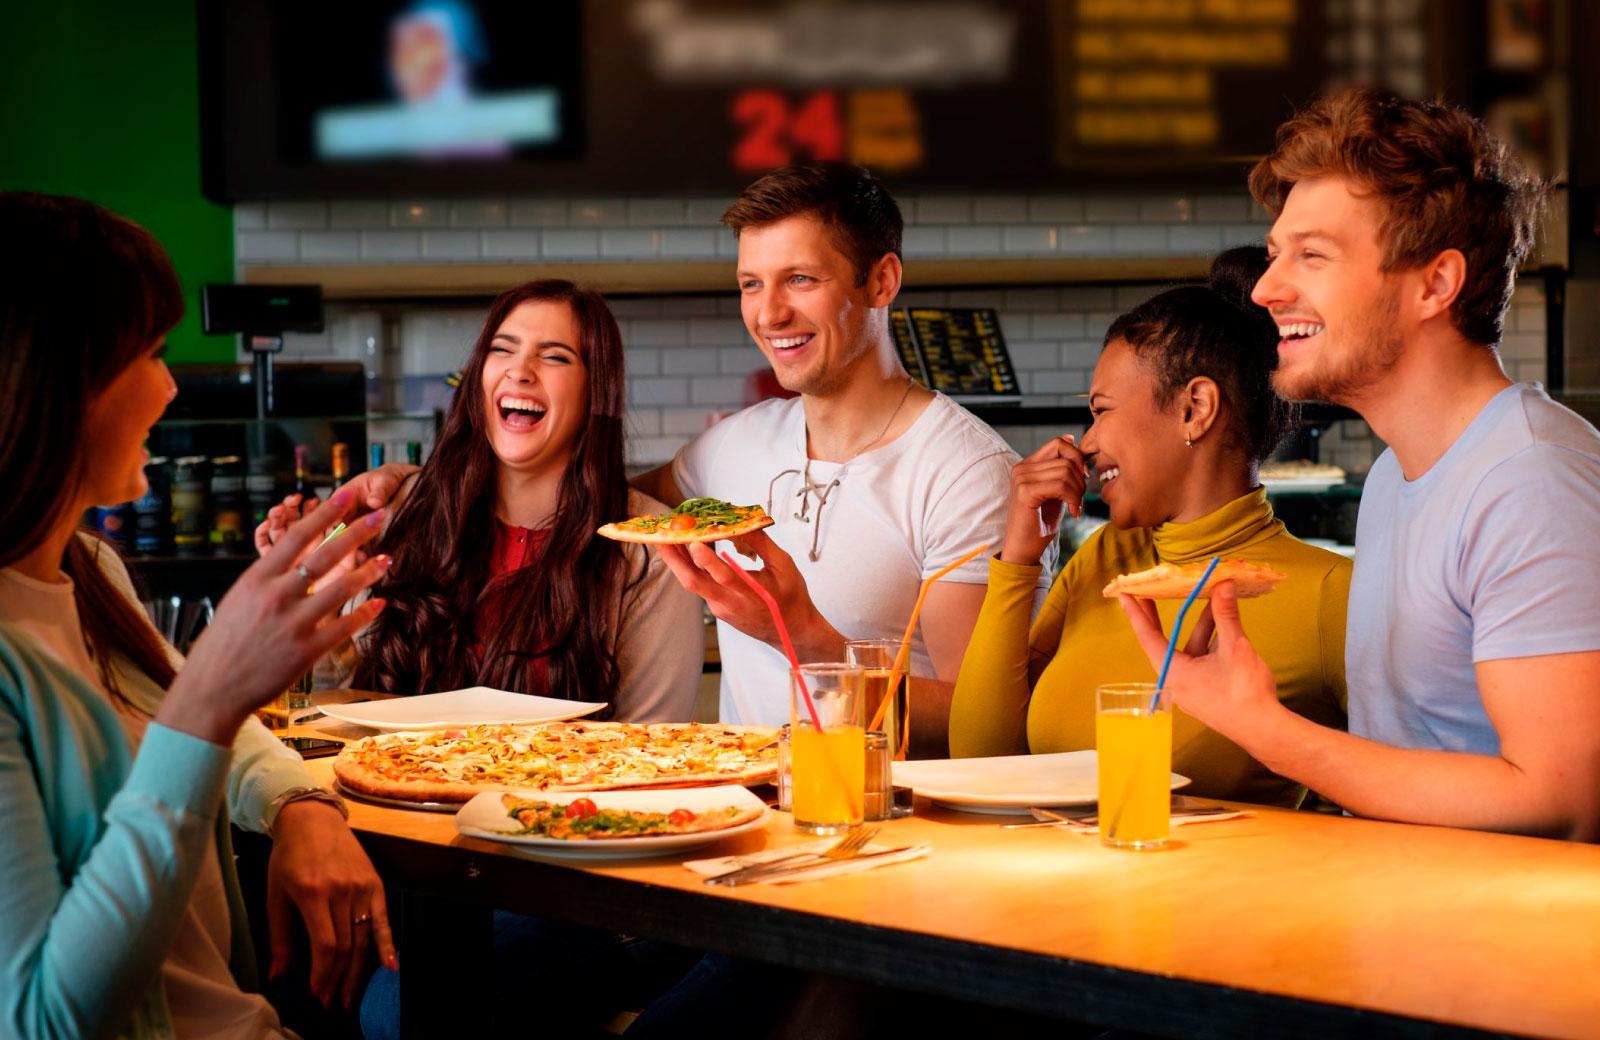 group of friends enjoying pizza